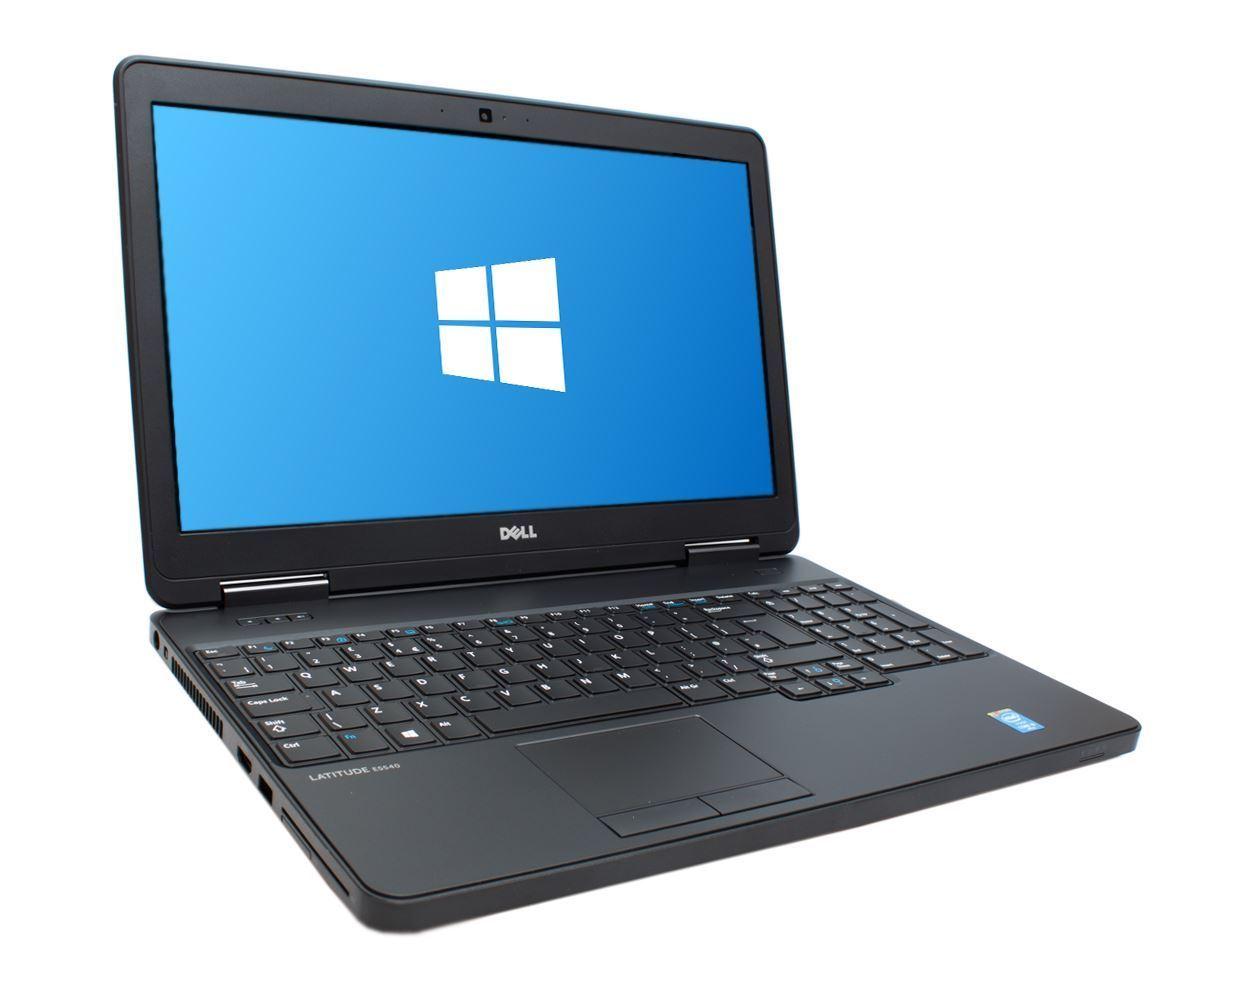 DELL E5540 img11 - Oliver Computer Store